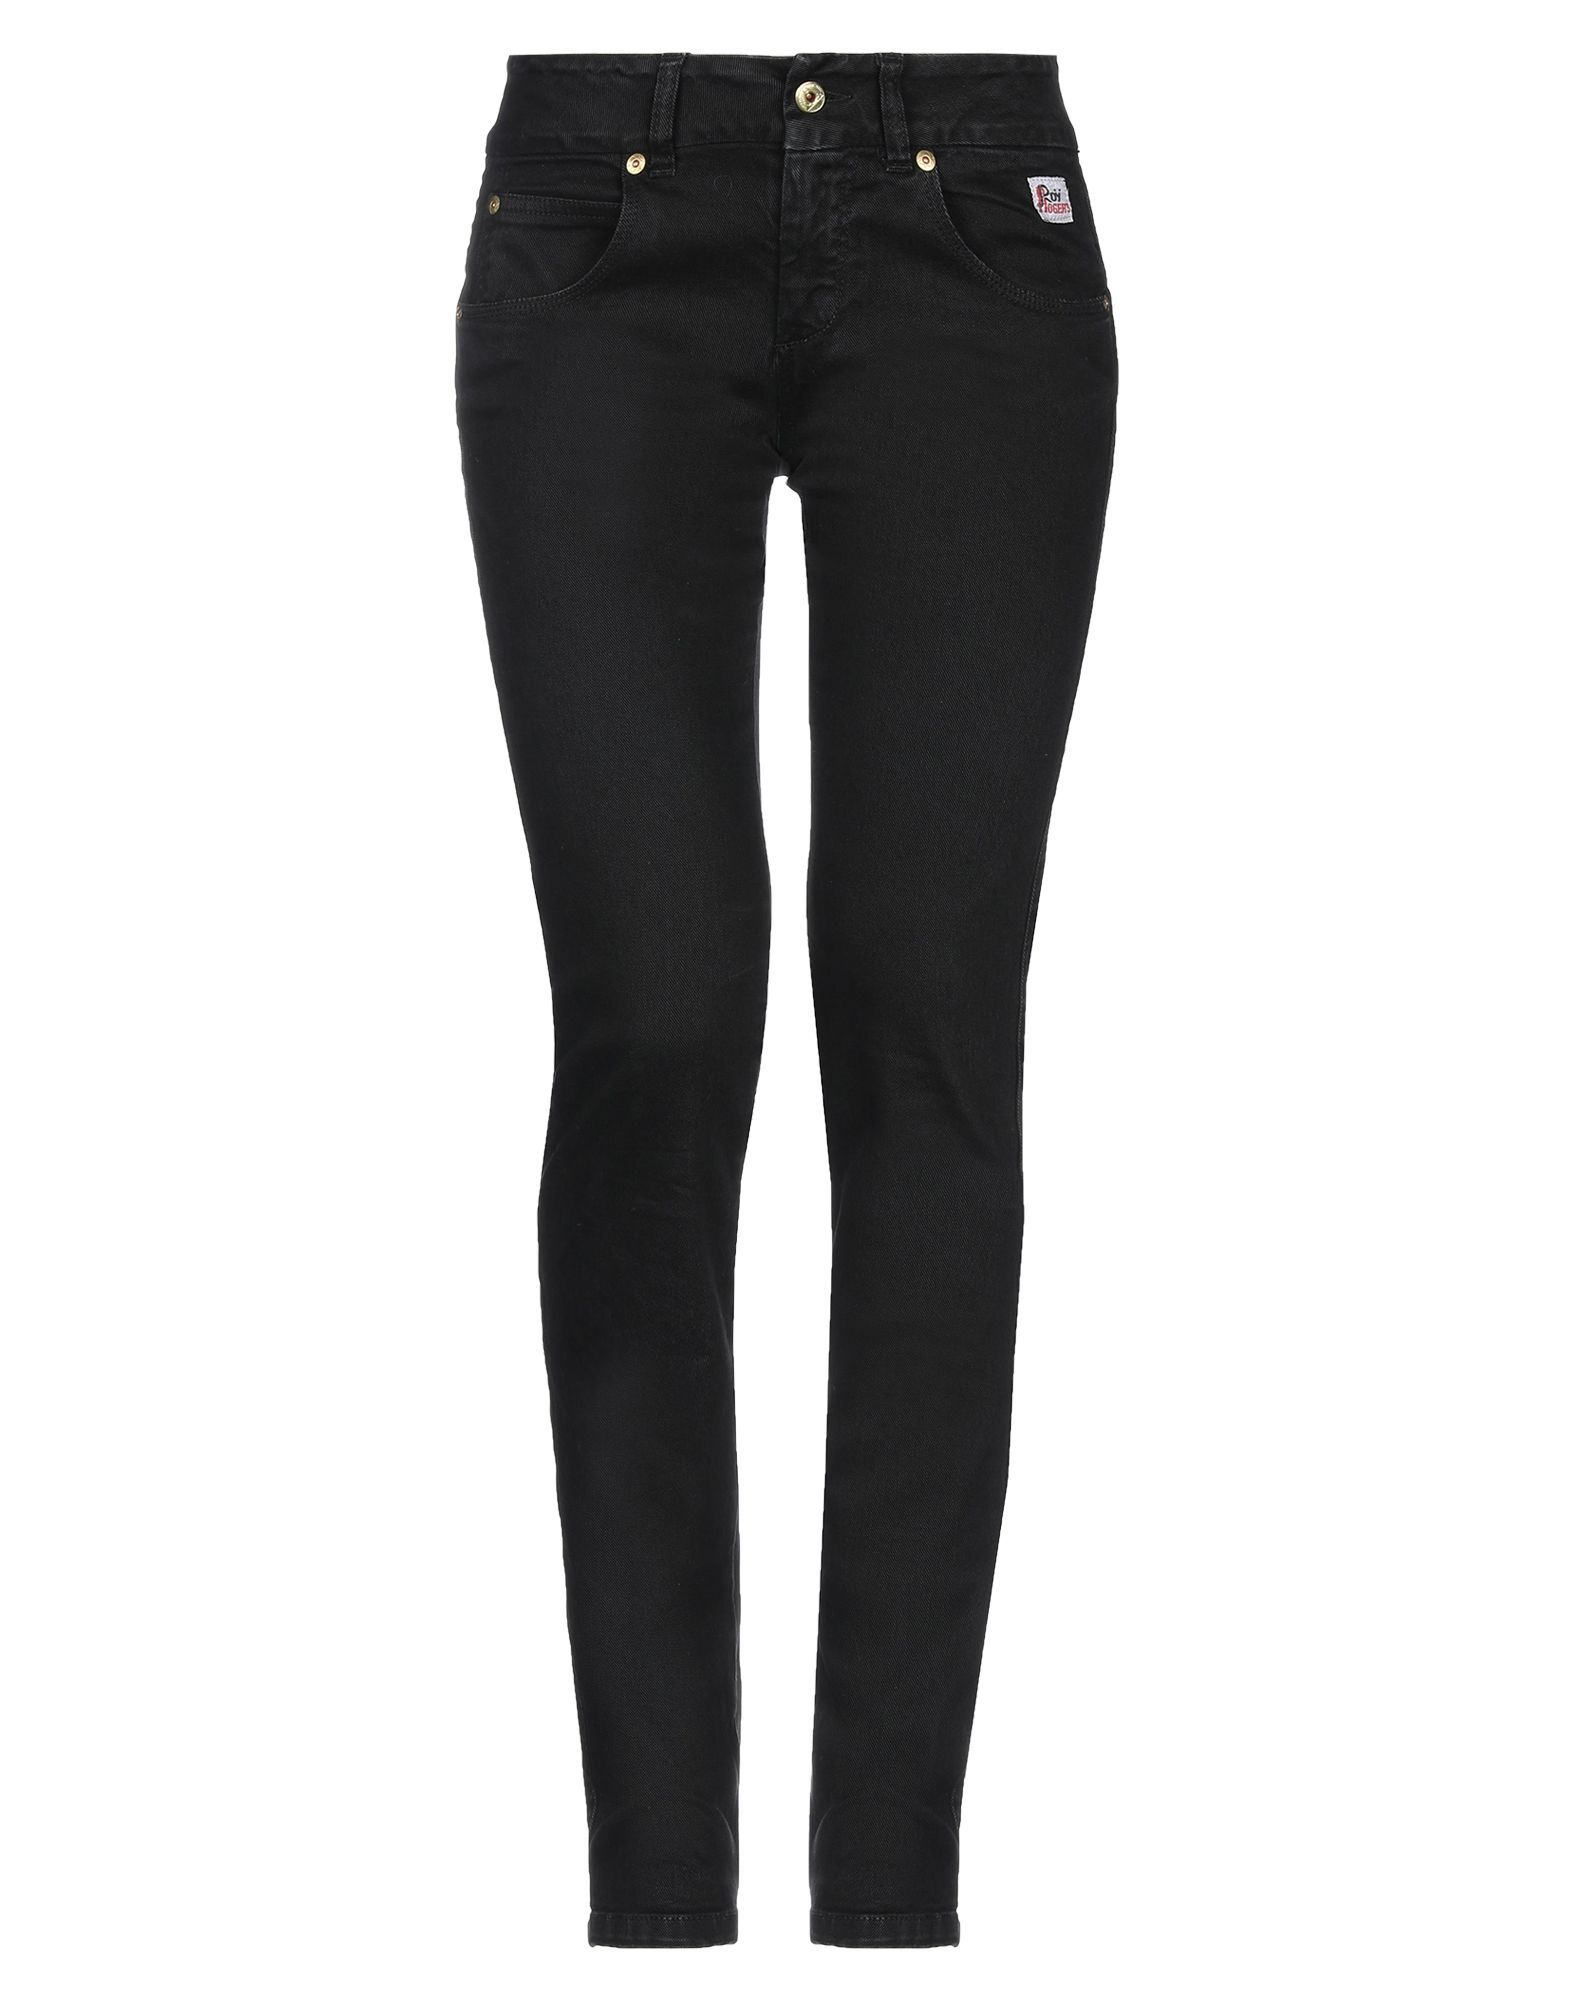 Roÿ Roger's Black Cotton Straight Leg Jeans